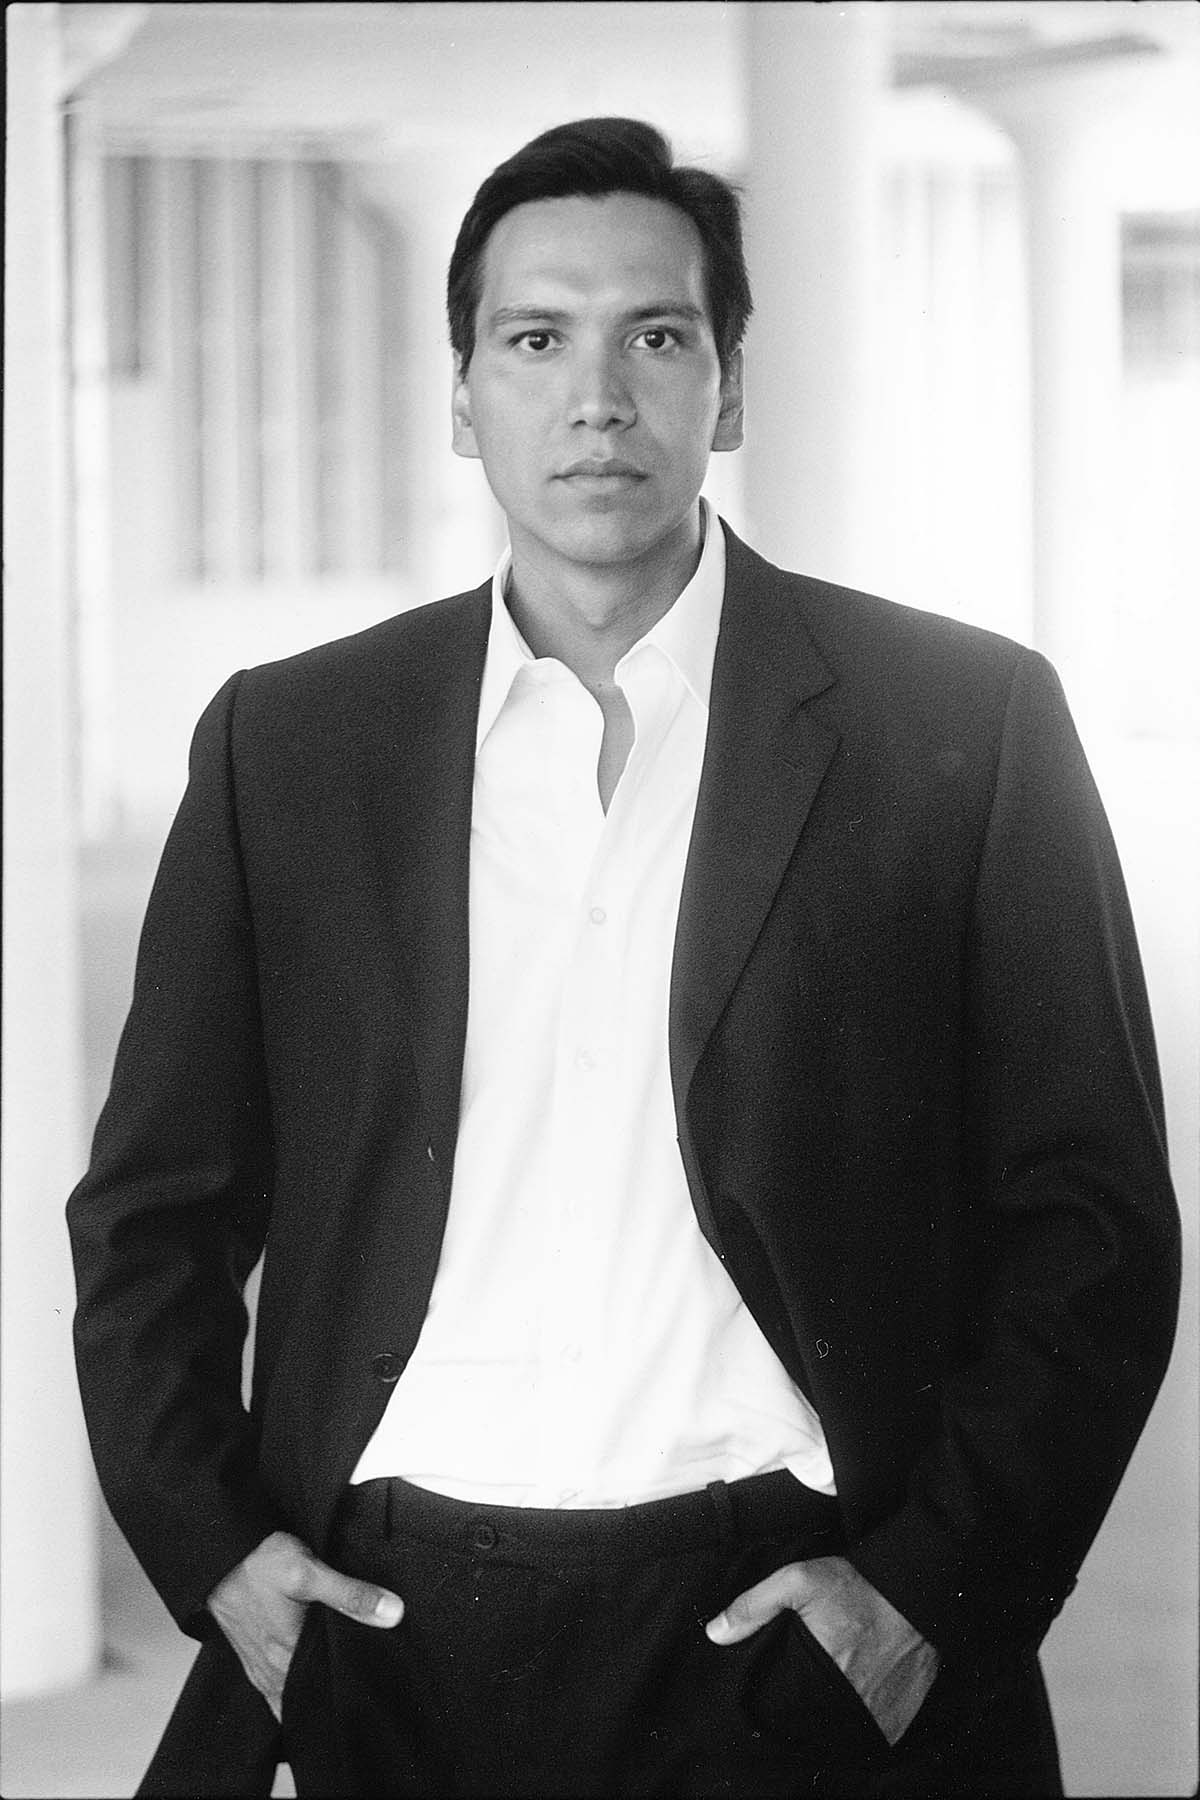 Michael greyeyes actor native american actors singers etc